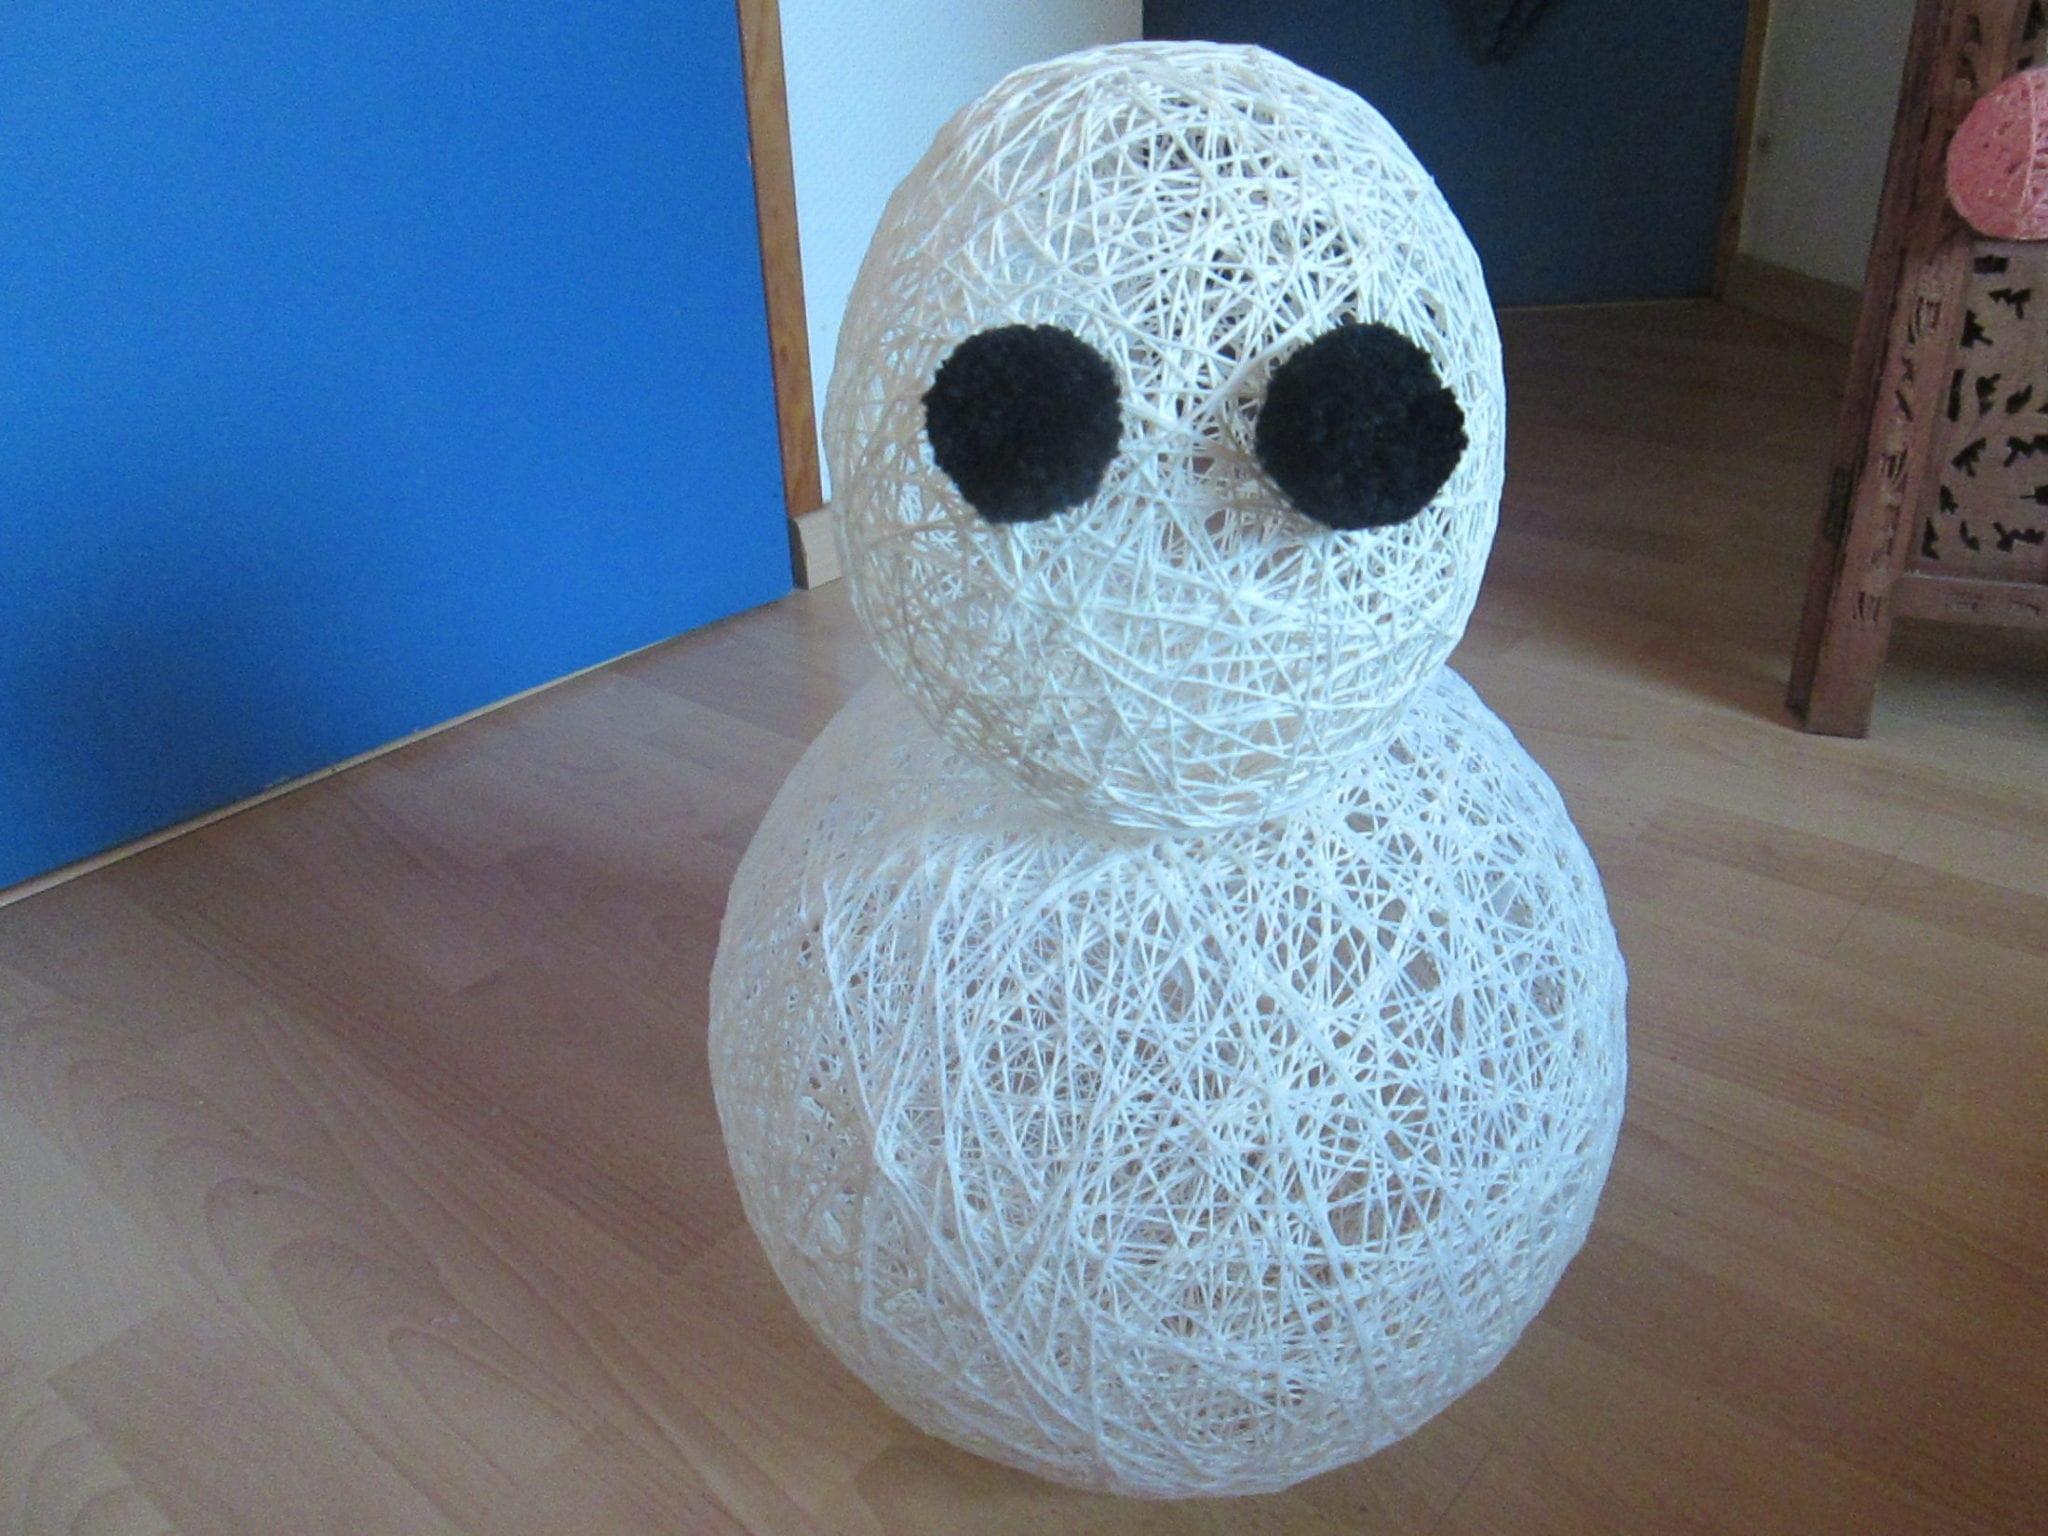 Bonhomme de neige - assemblage